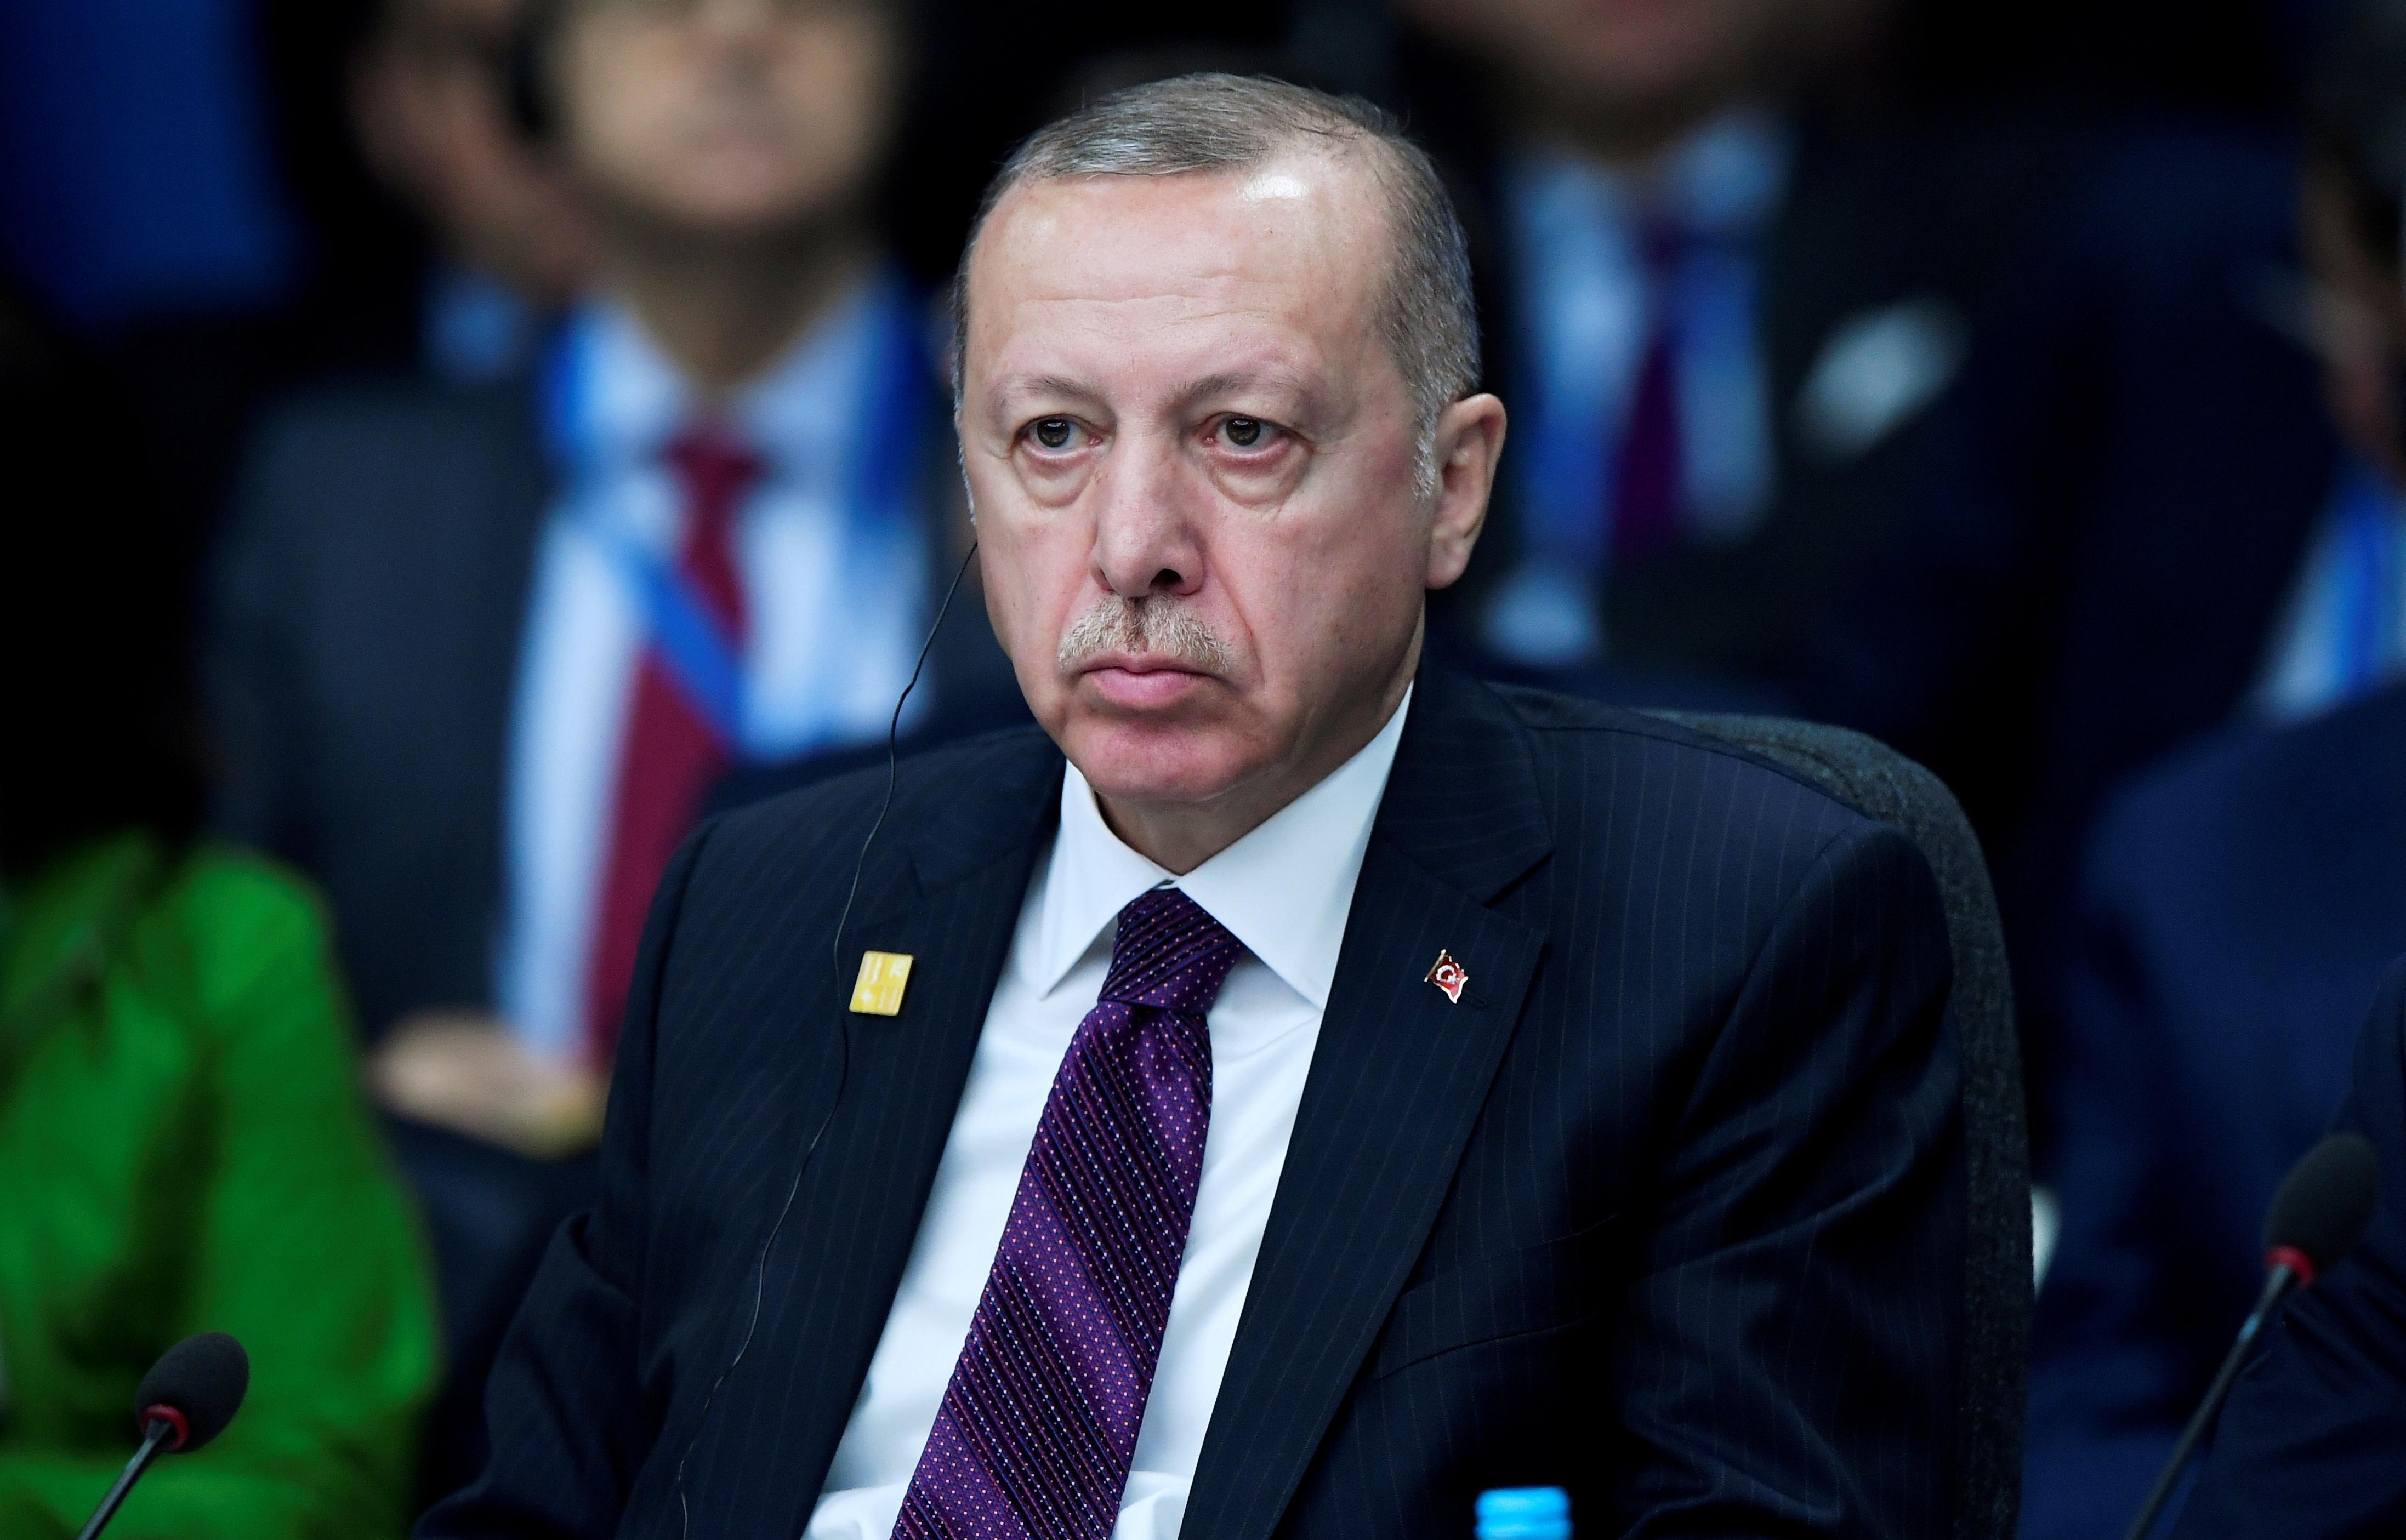 Turkey ready to give any military support Libya needs - Erdogan